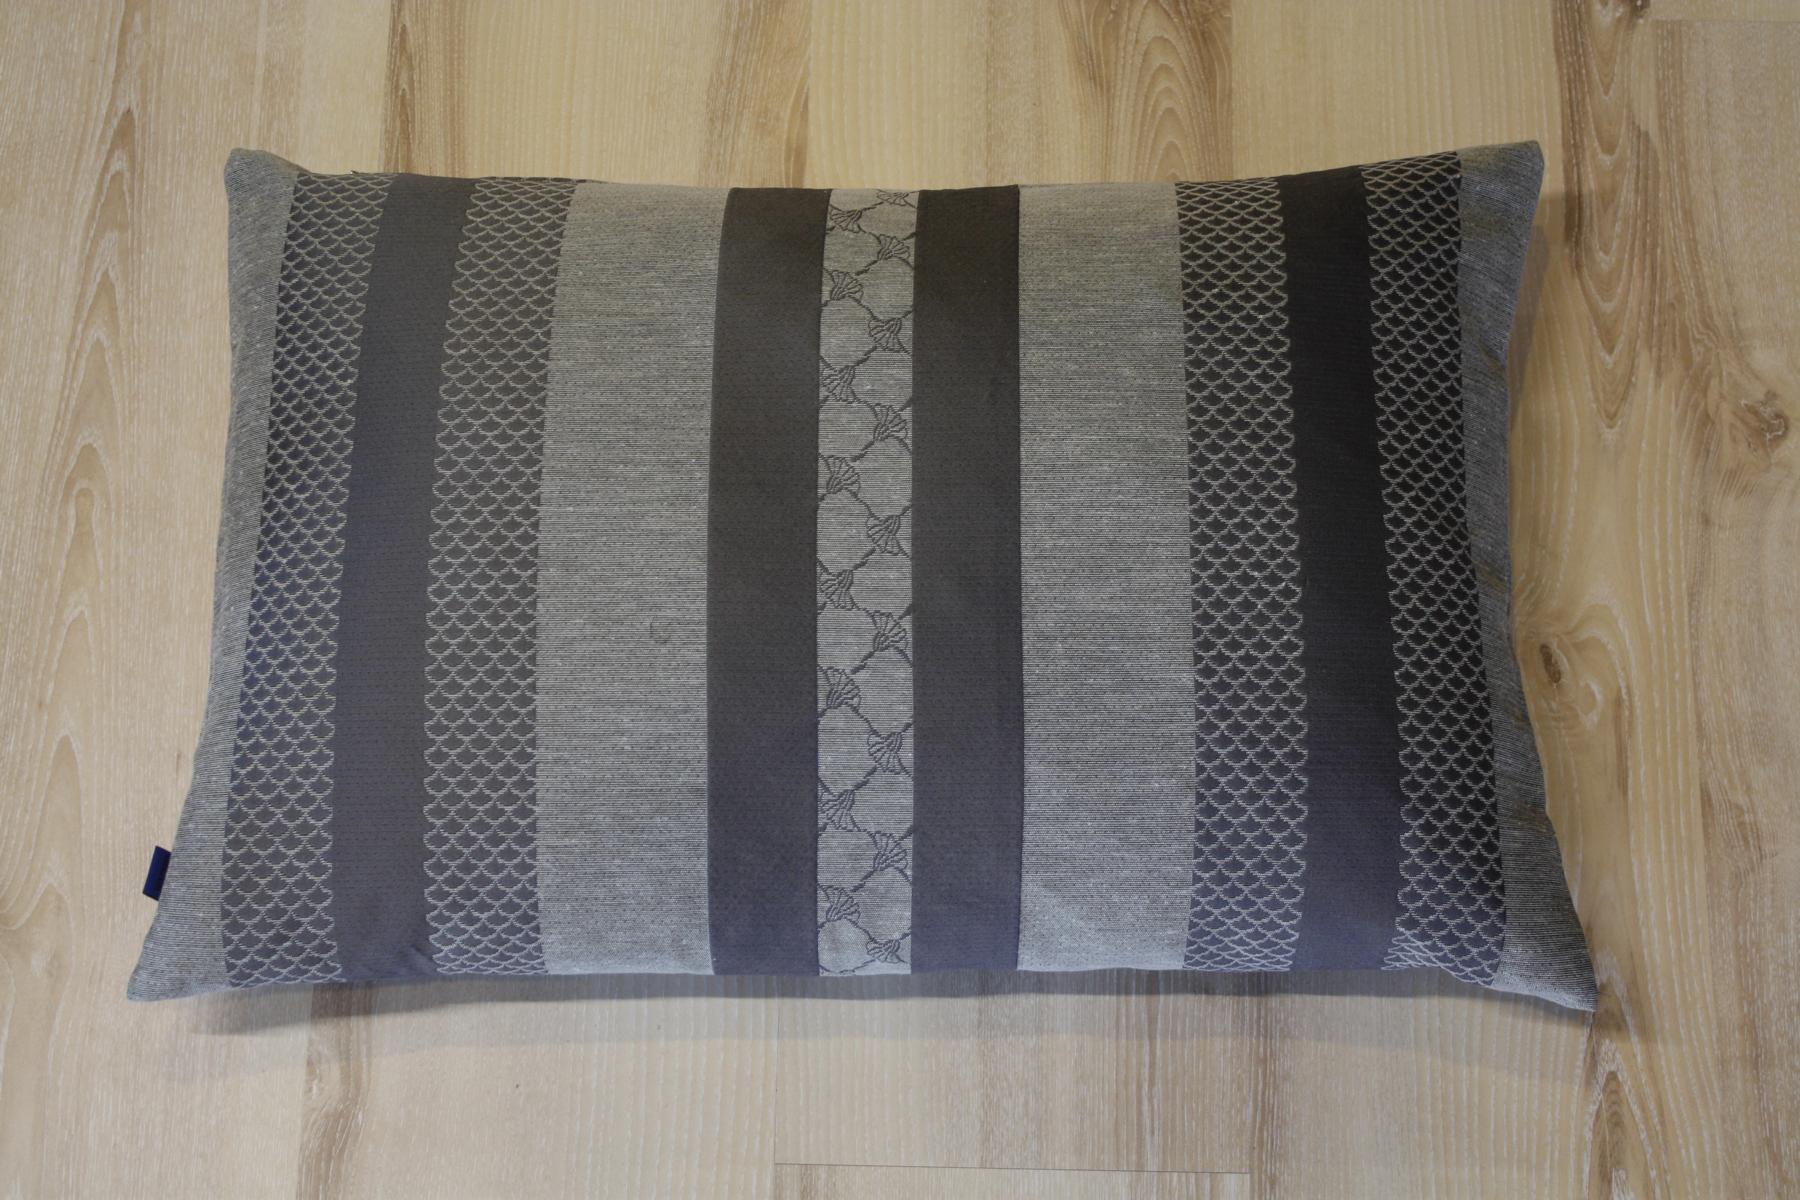 joop kissen glory 010 grau 40x60 cm inkl federf llung ebay. Black Bedroom Furniture Sets. Home Design Ideas